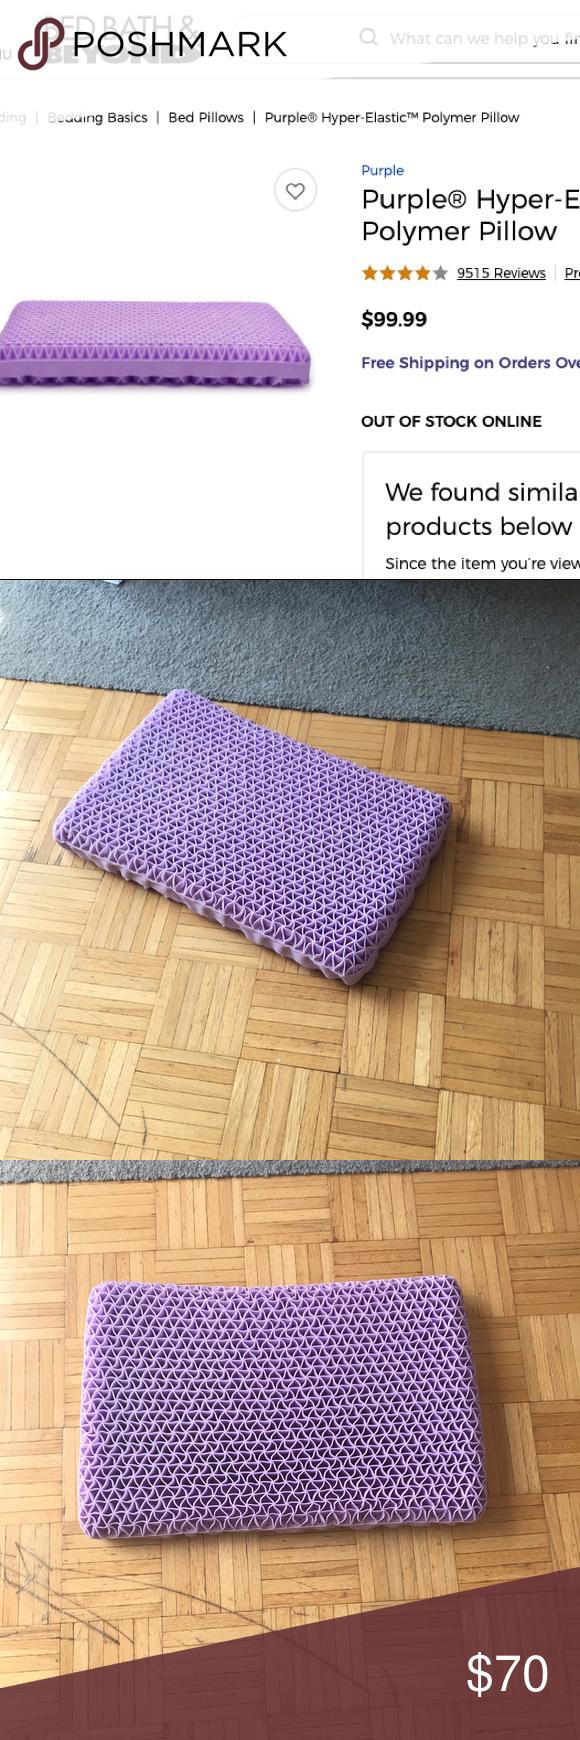 purple hyper elastic polymer pillow